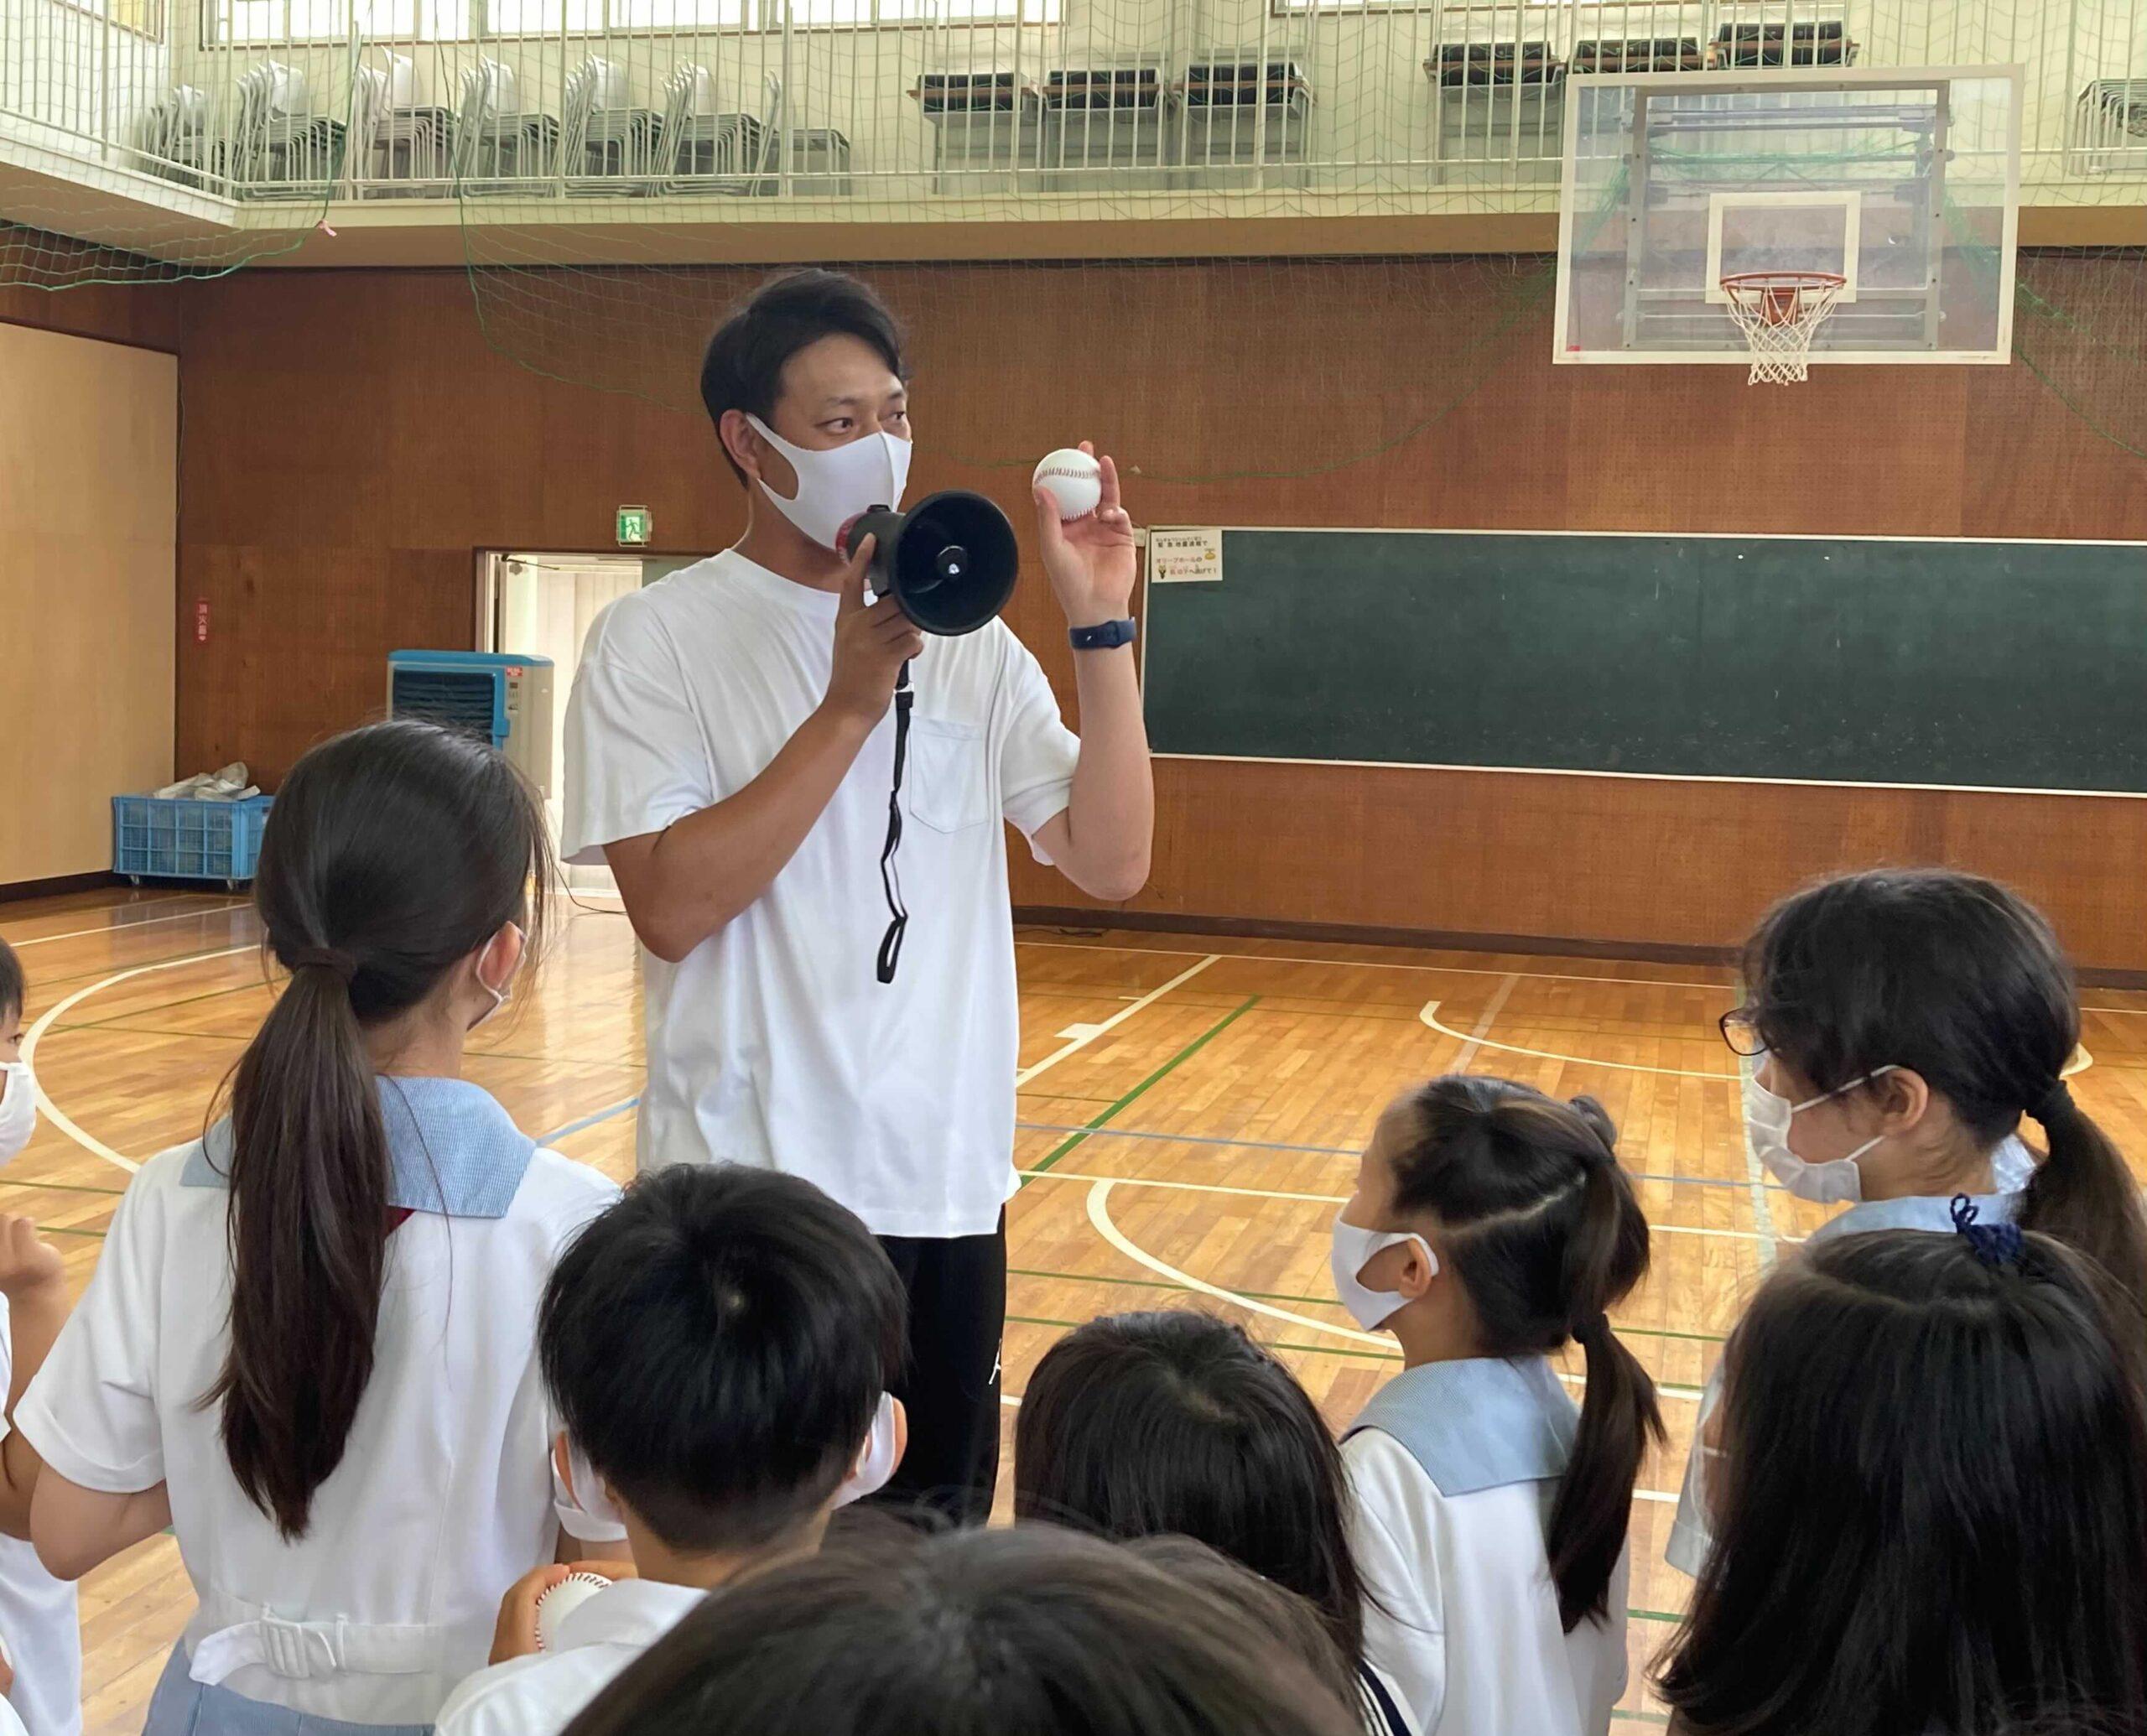 POD x 放課後NPOアフタースクール シリーズ第一弾: 岩隈久志氏(MLBシアトル・マリナーズ特任コーチ)